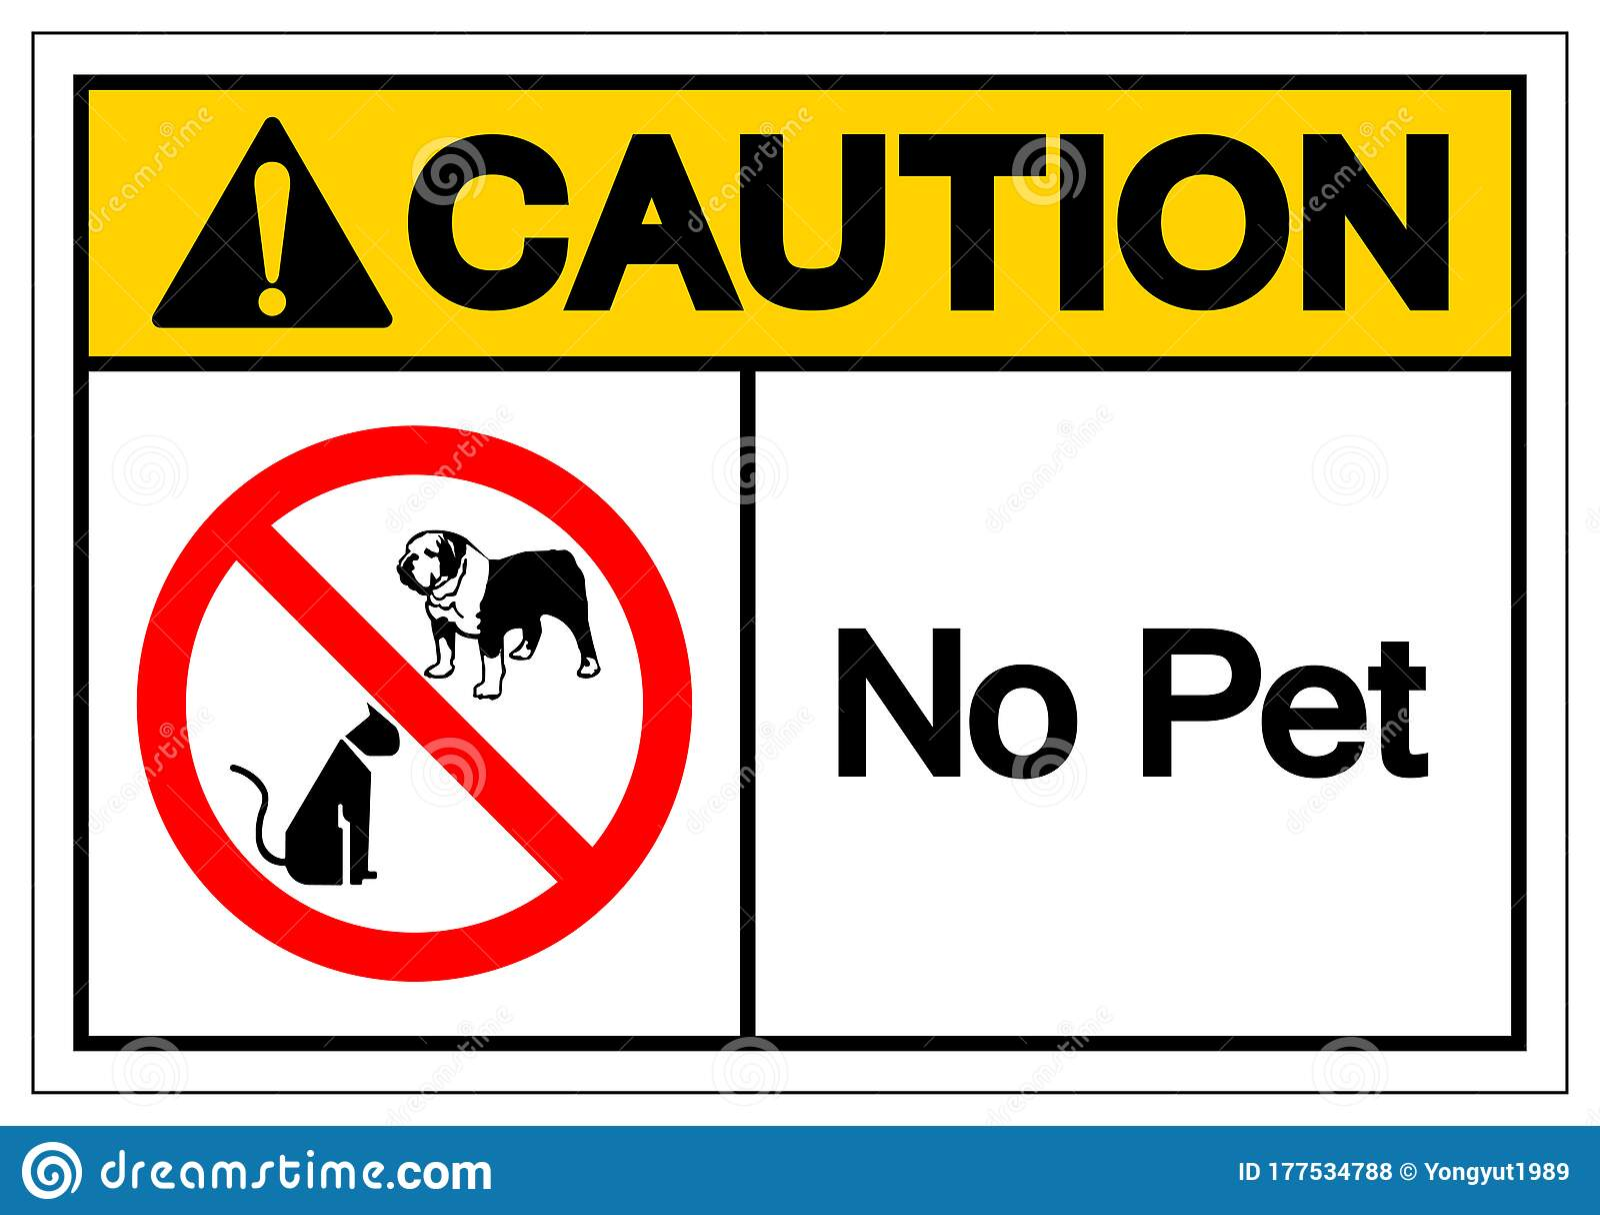 Caution No Pet Symbol Sign Vector Illustration Isolate